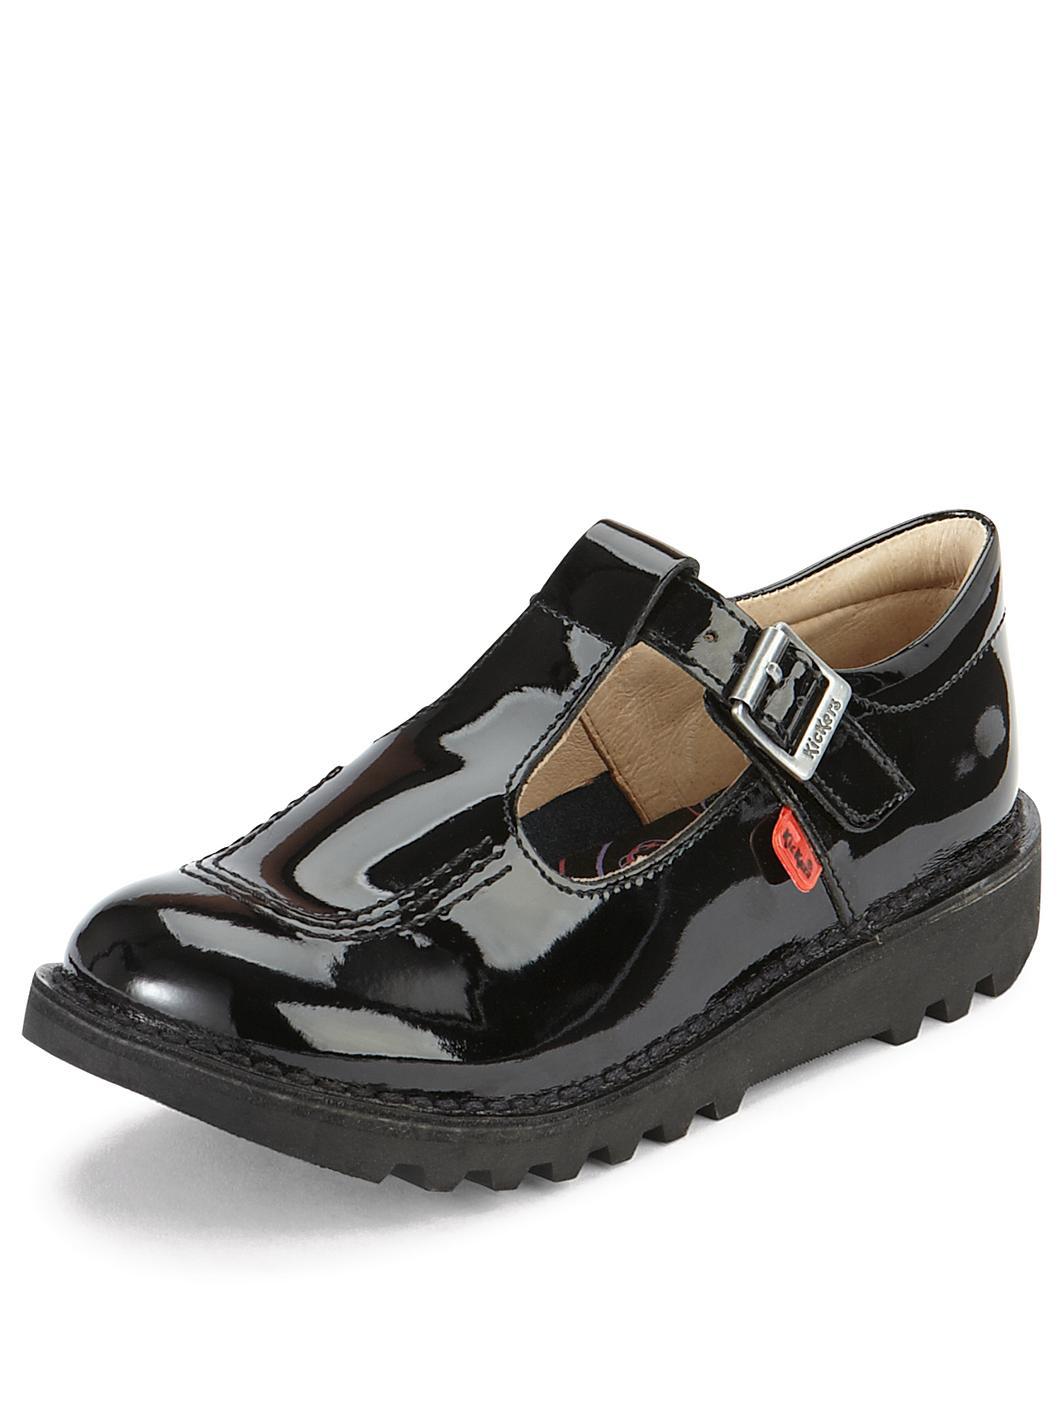 Kickers Fragma T-Bar Older Girls School Shoes Black